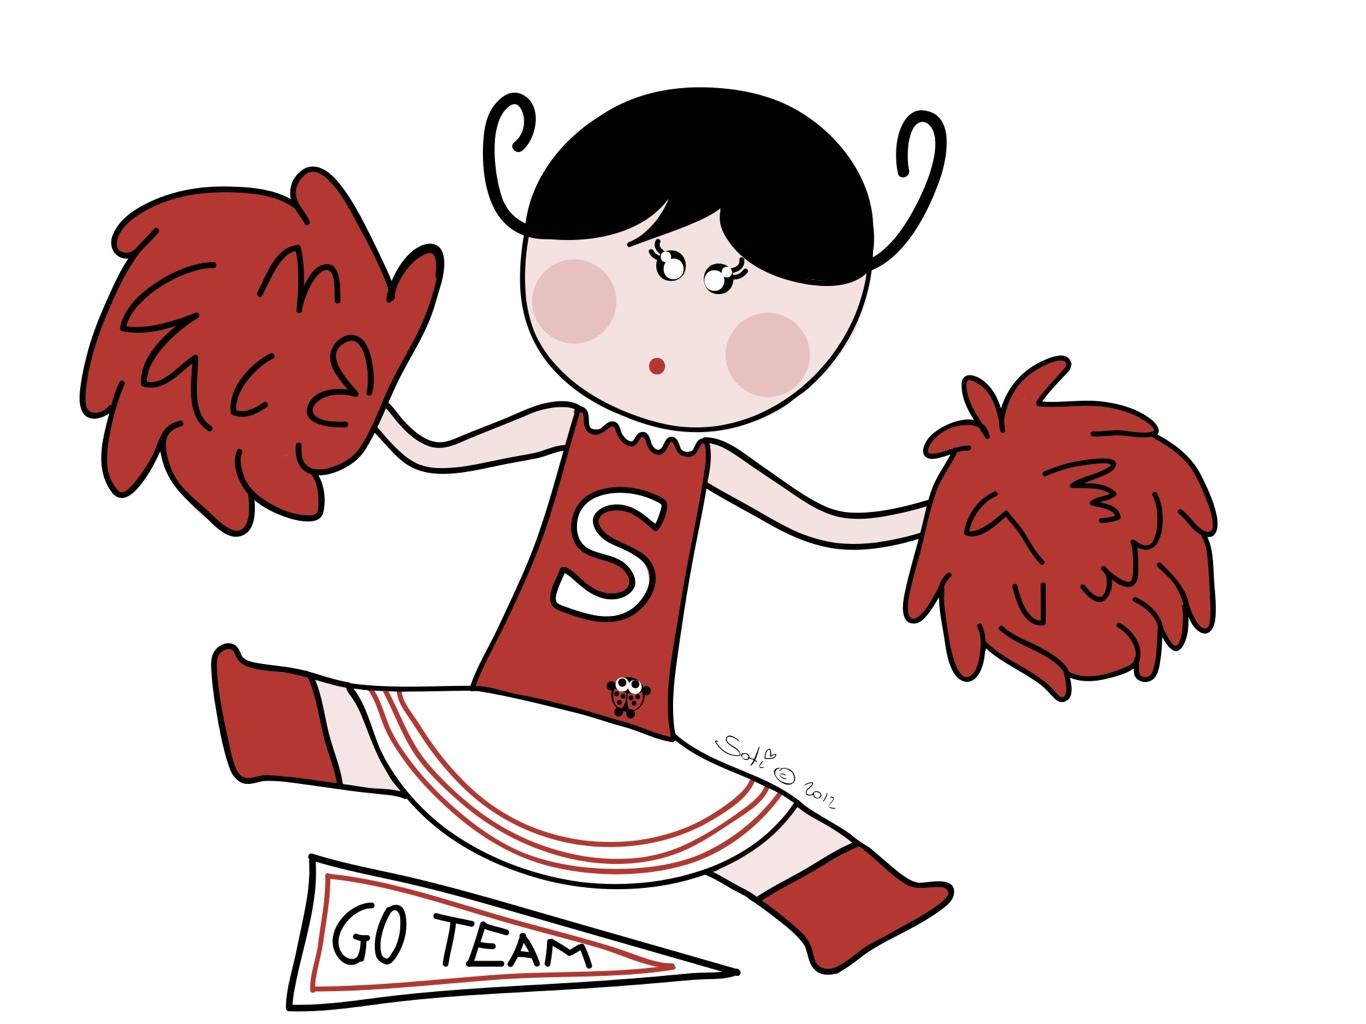 Free Cheerleader Cartoon Pictures, Download Free Clip Art.